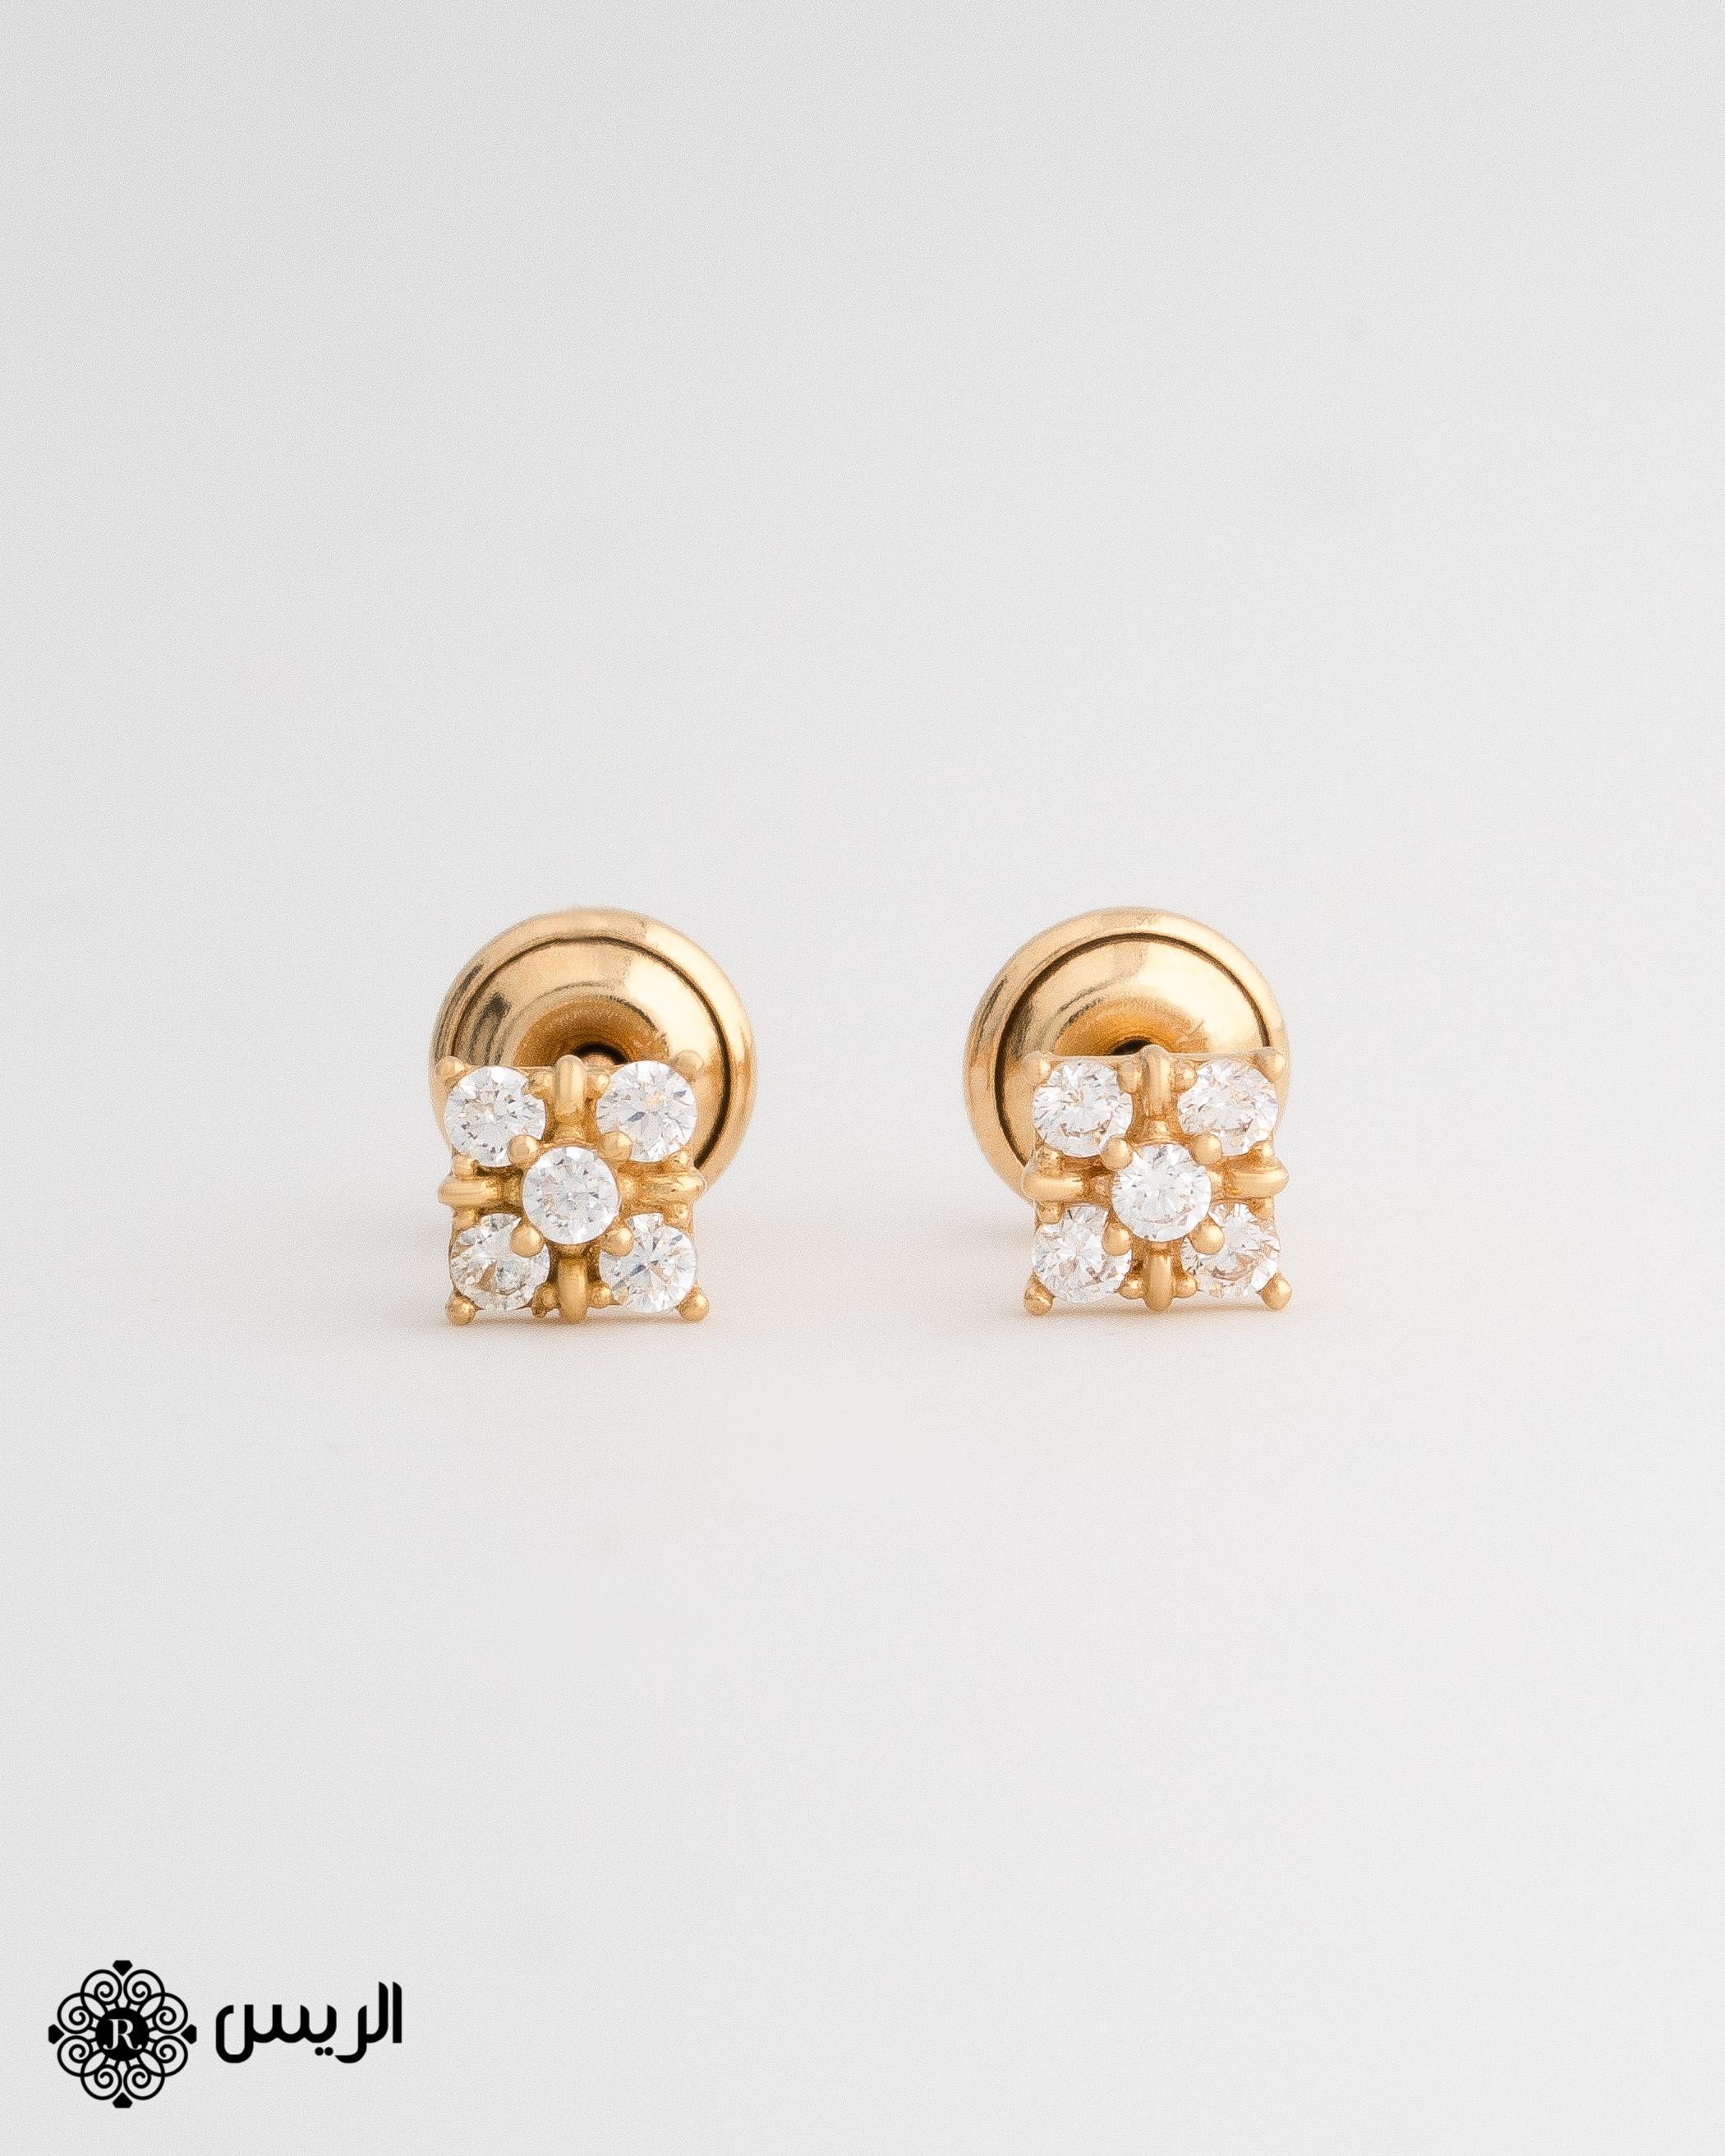 Raies jewelry Kids Earrings with حلق أطفال الريس للمجوهرات